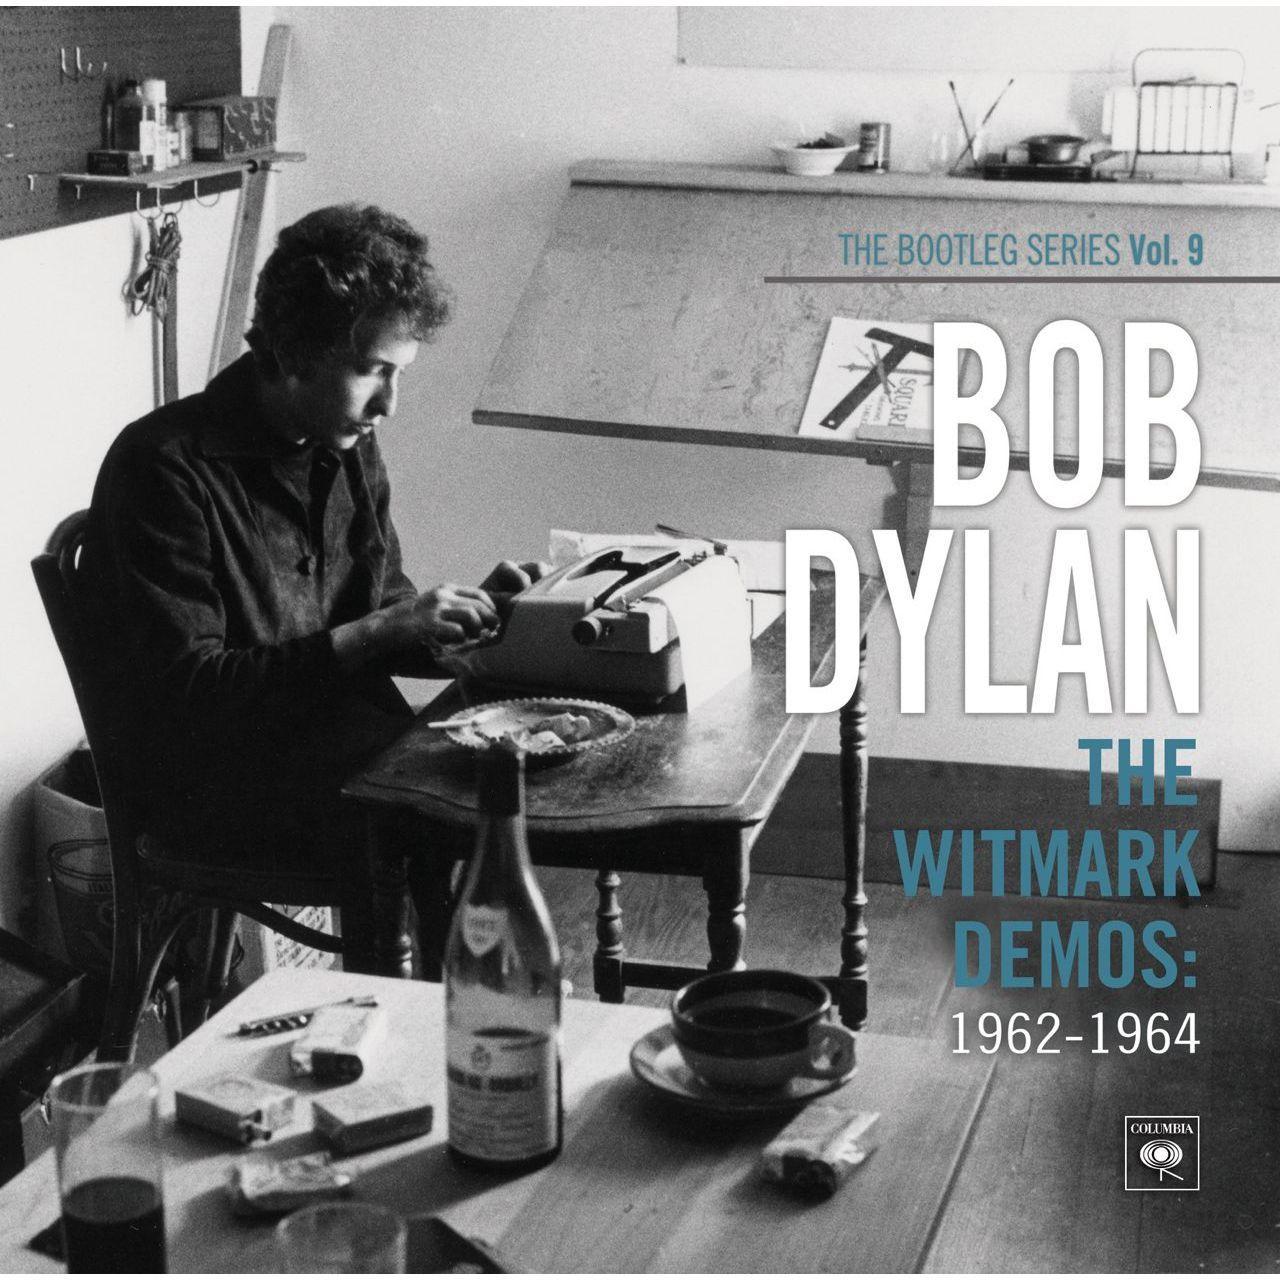 Bob Dylan The Bootleg Series Vol 9 The Witmark Demos 1962 1964 Bob Dylan Dylan Songs Dylan